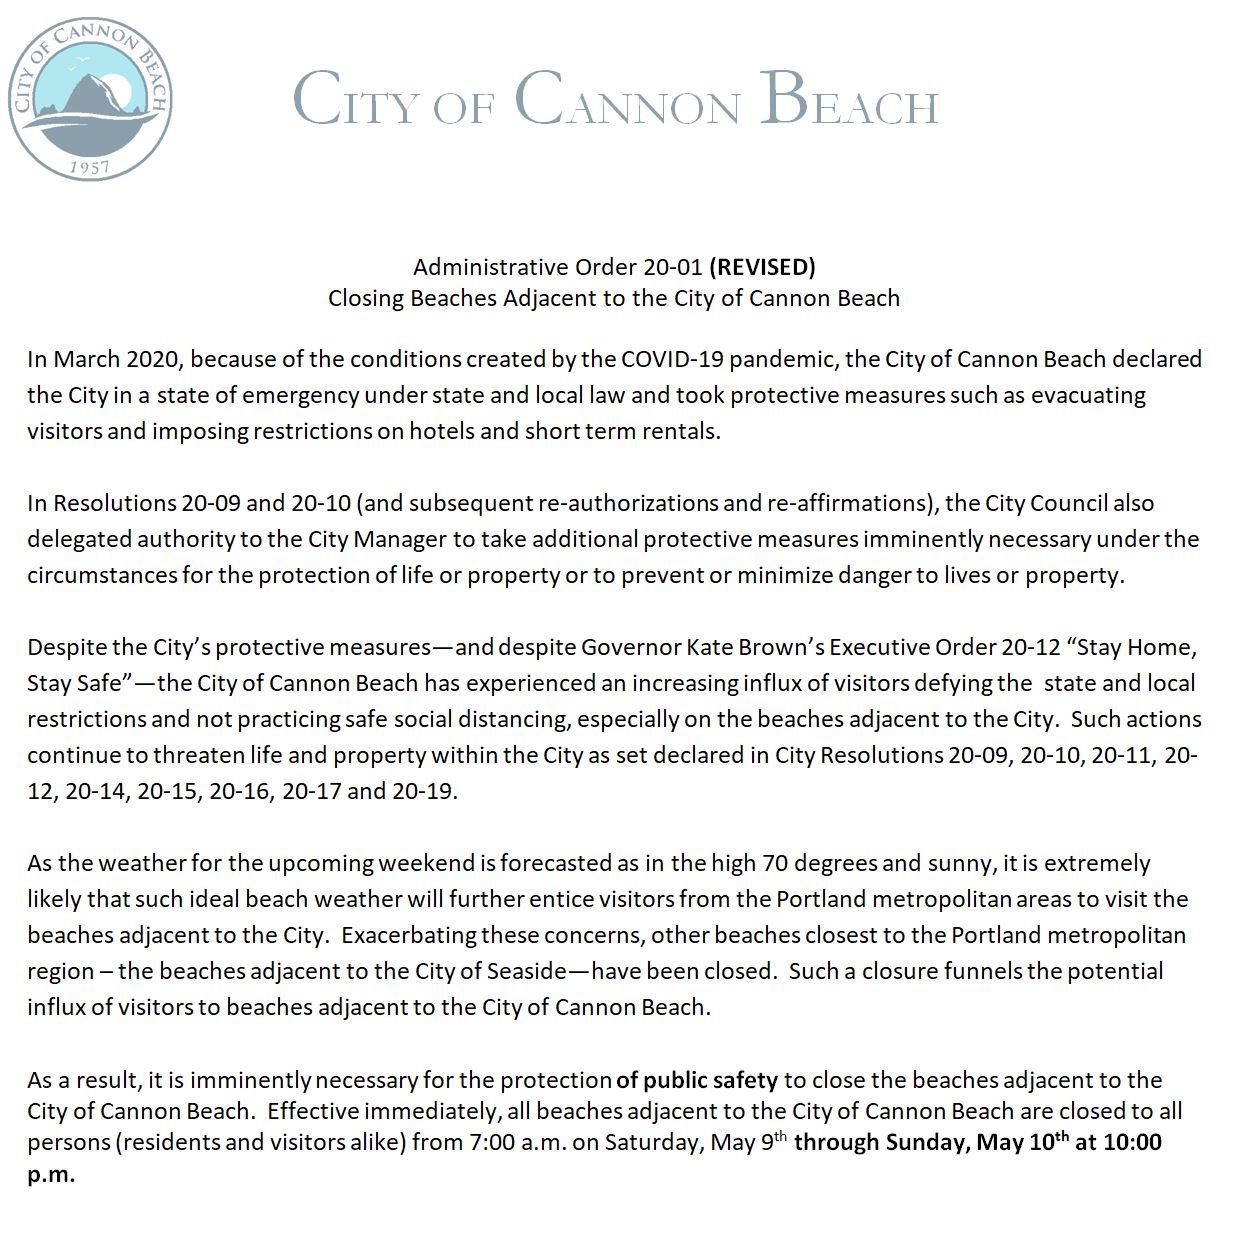 Beach Closure Administrative Order 20-01